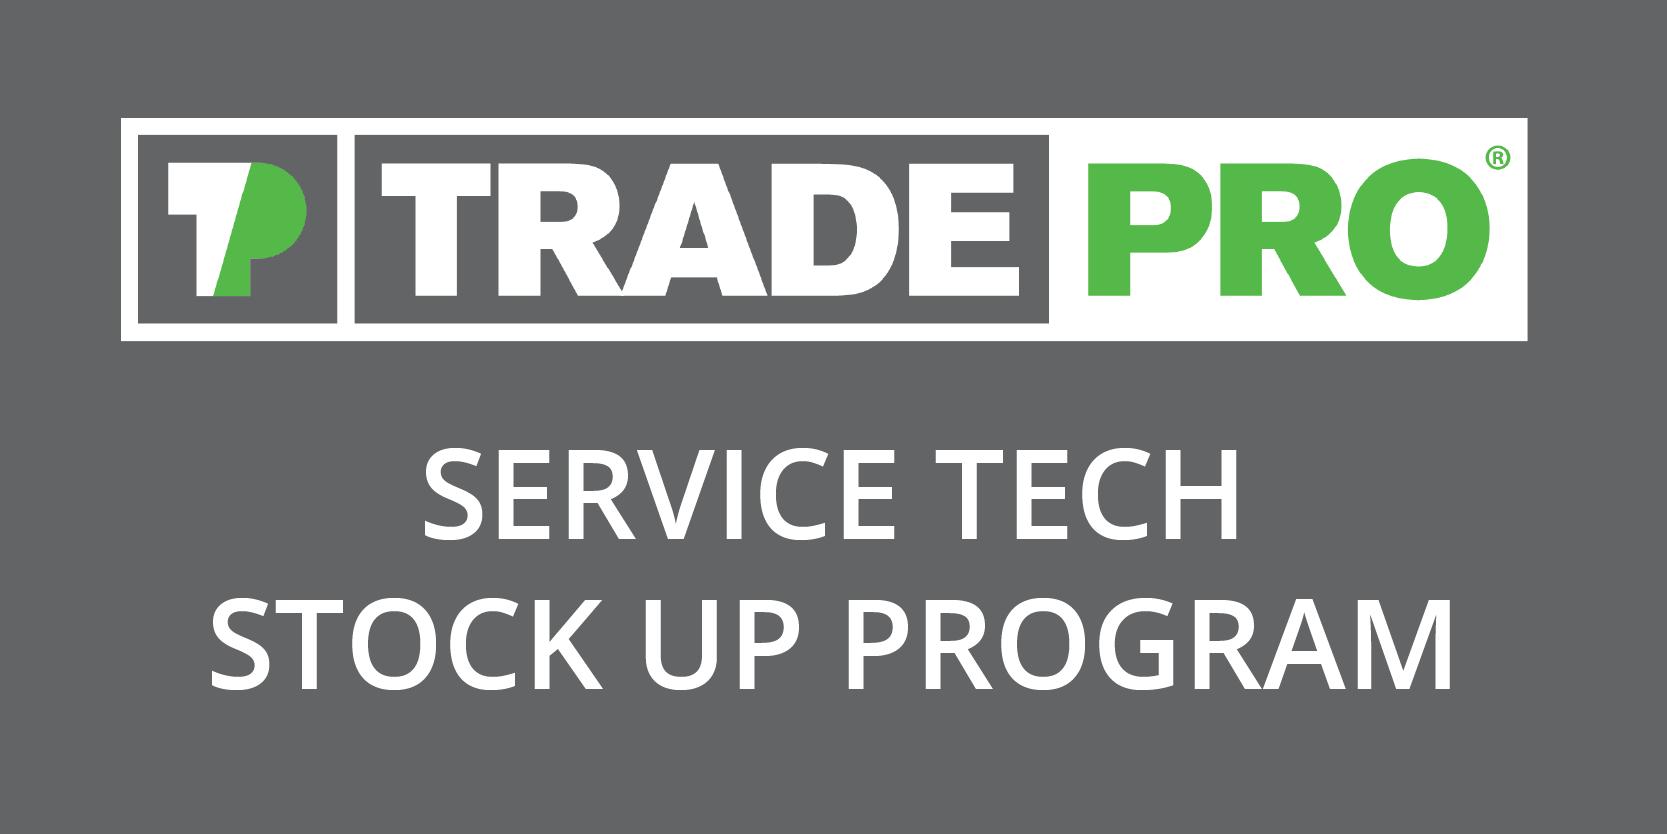 Tradepro Stock Up Program